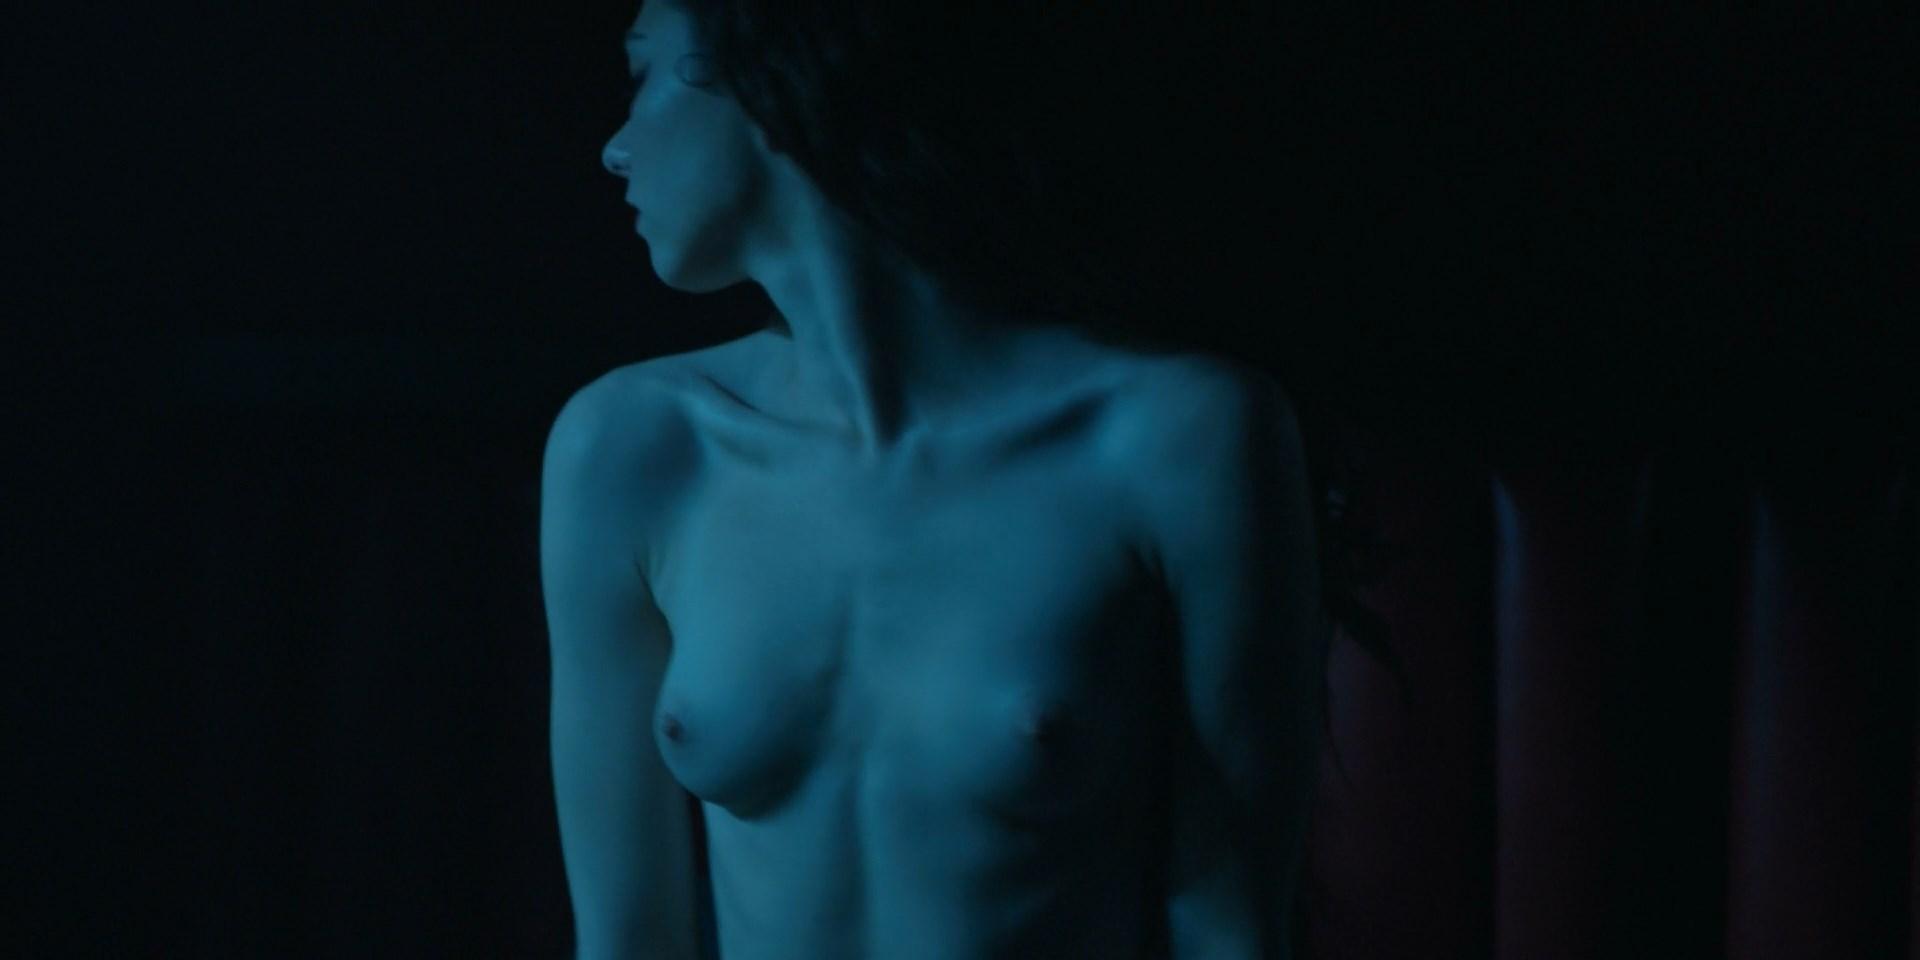 Quinn Cooke nude - Ozark s01e03 (2017)